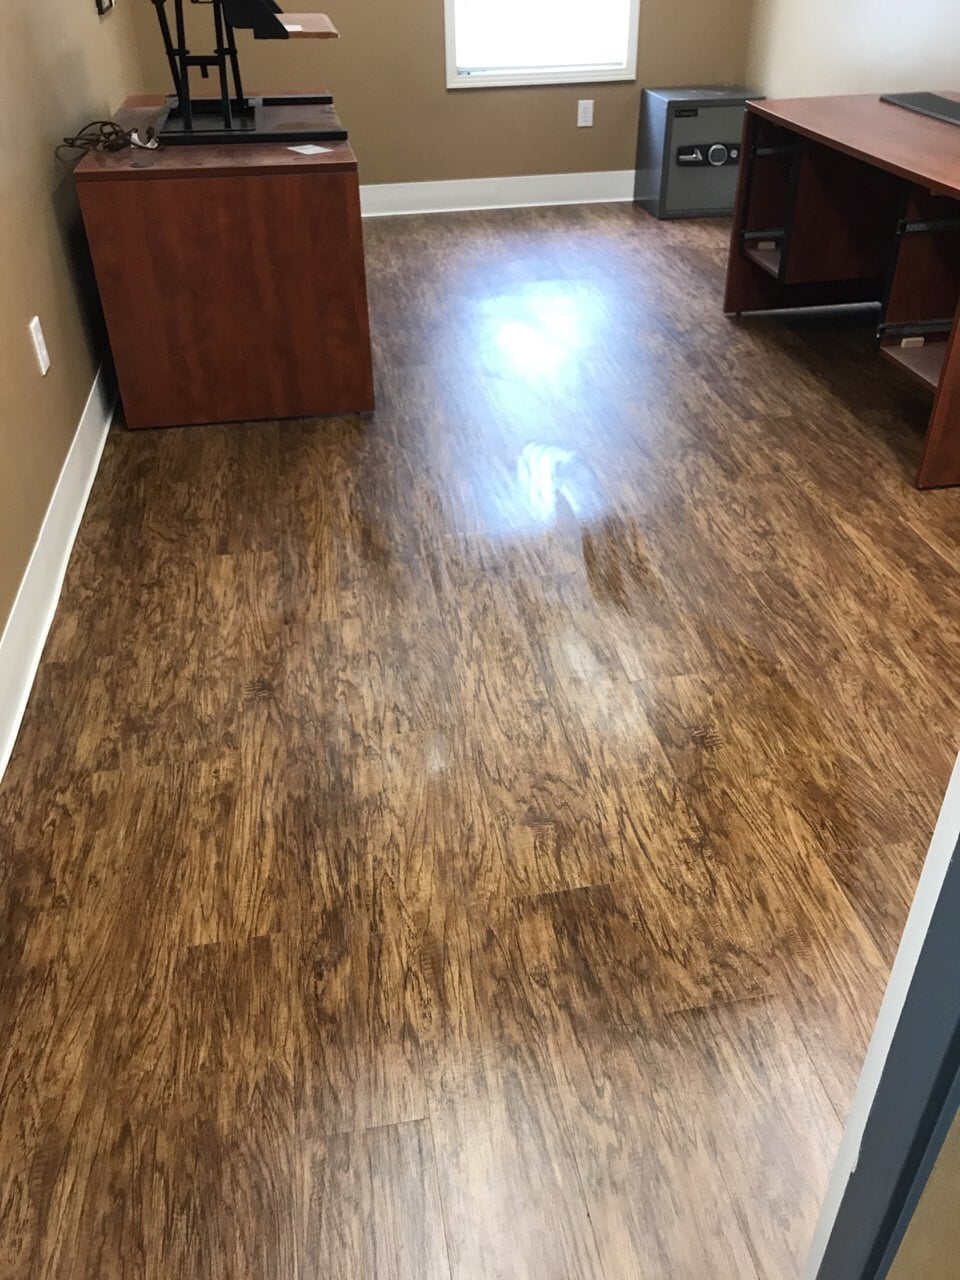 Modern wood look flooring in Nashville, TN from Absolute Flooring Inc